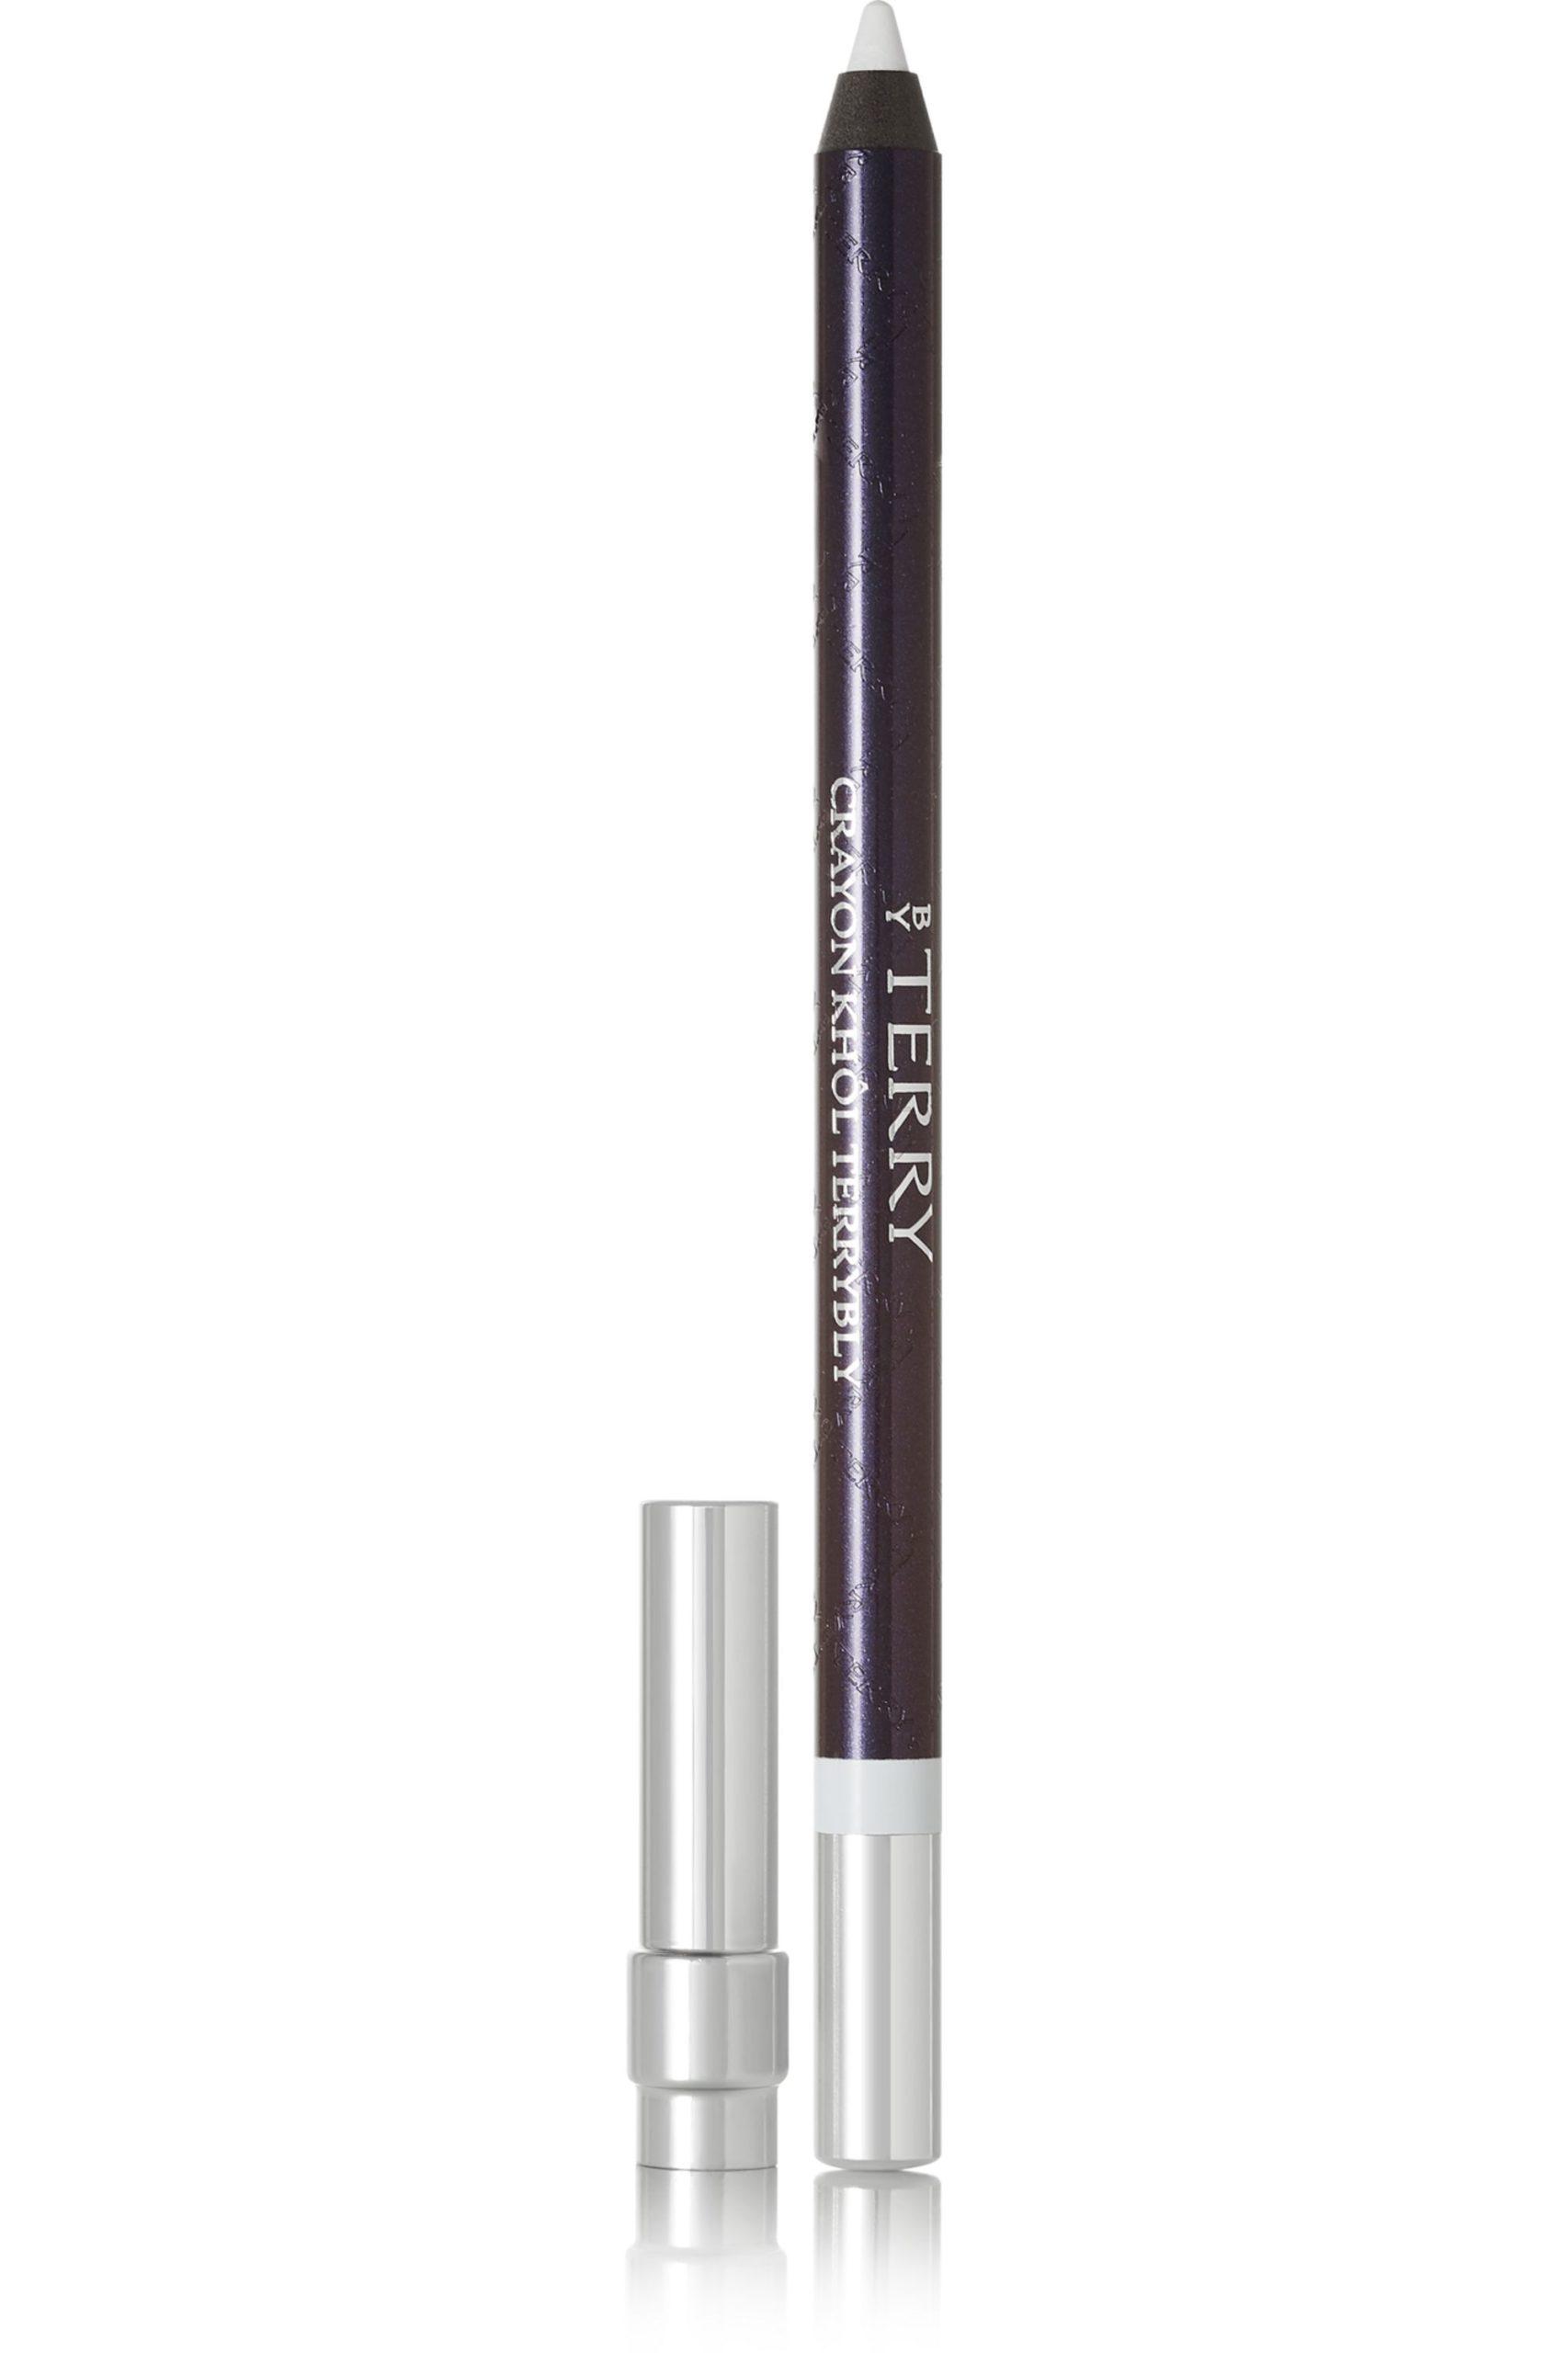 Crayon Khol Terrybly Waterproof Eyeliner Pencil - 16 White Wish